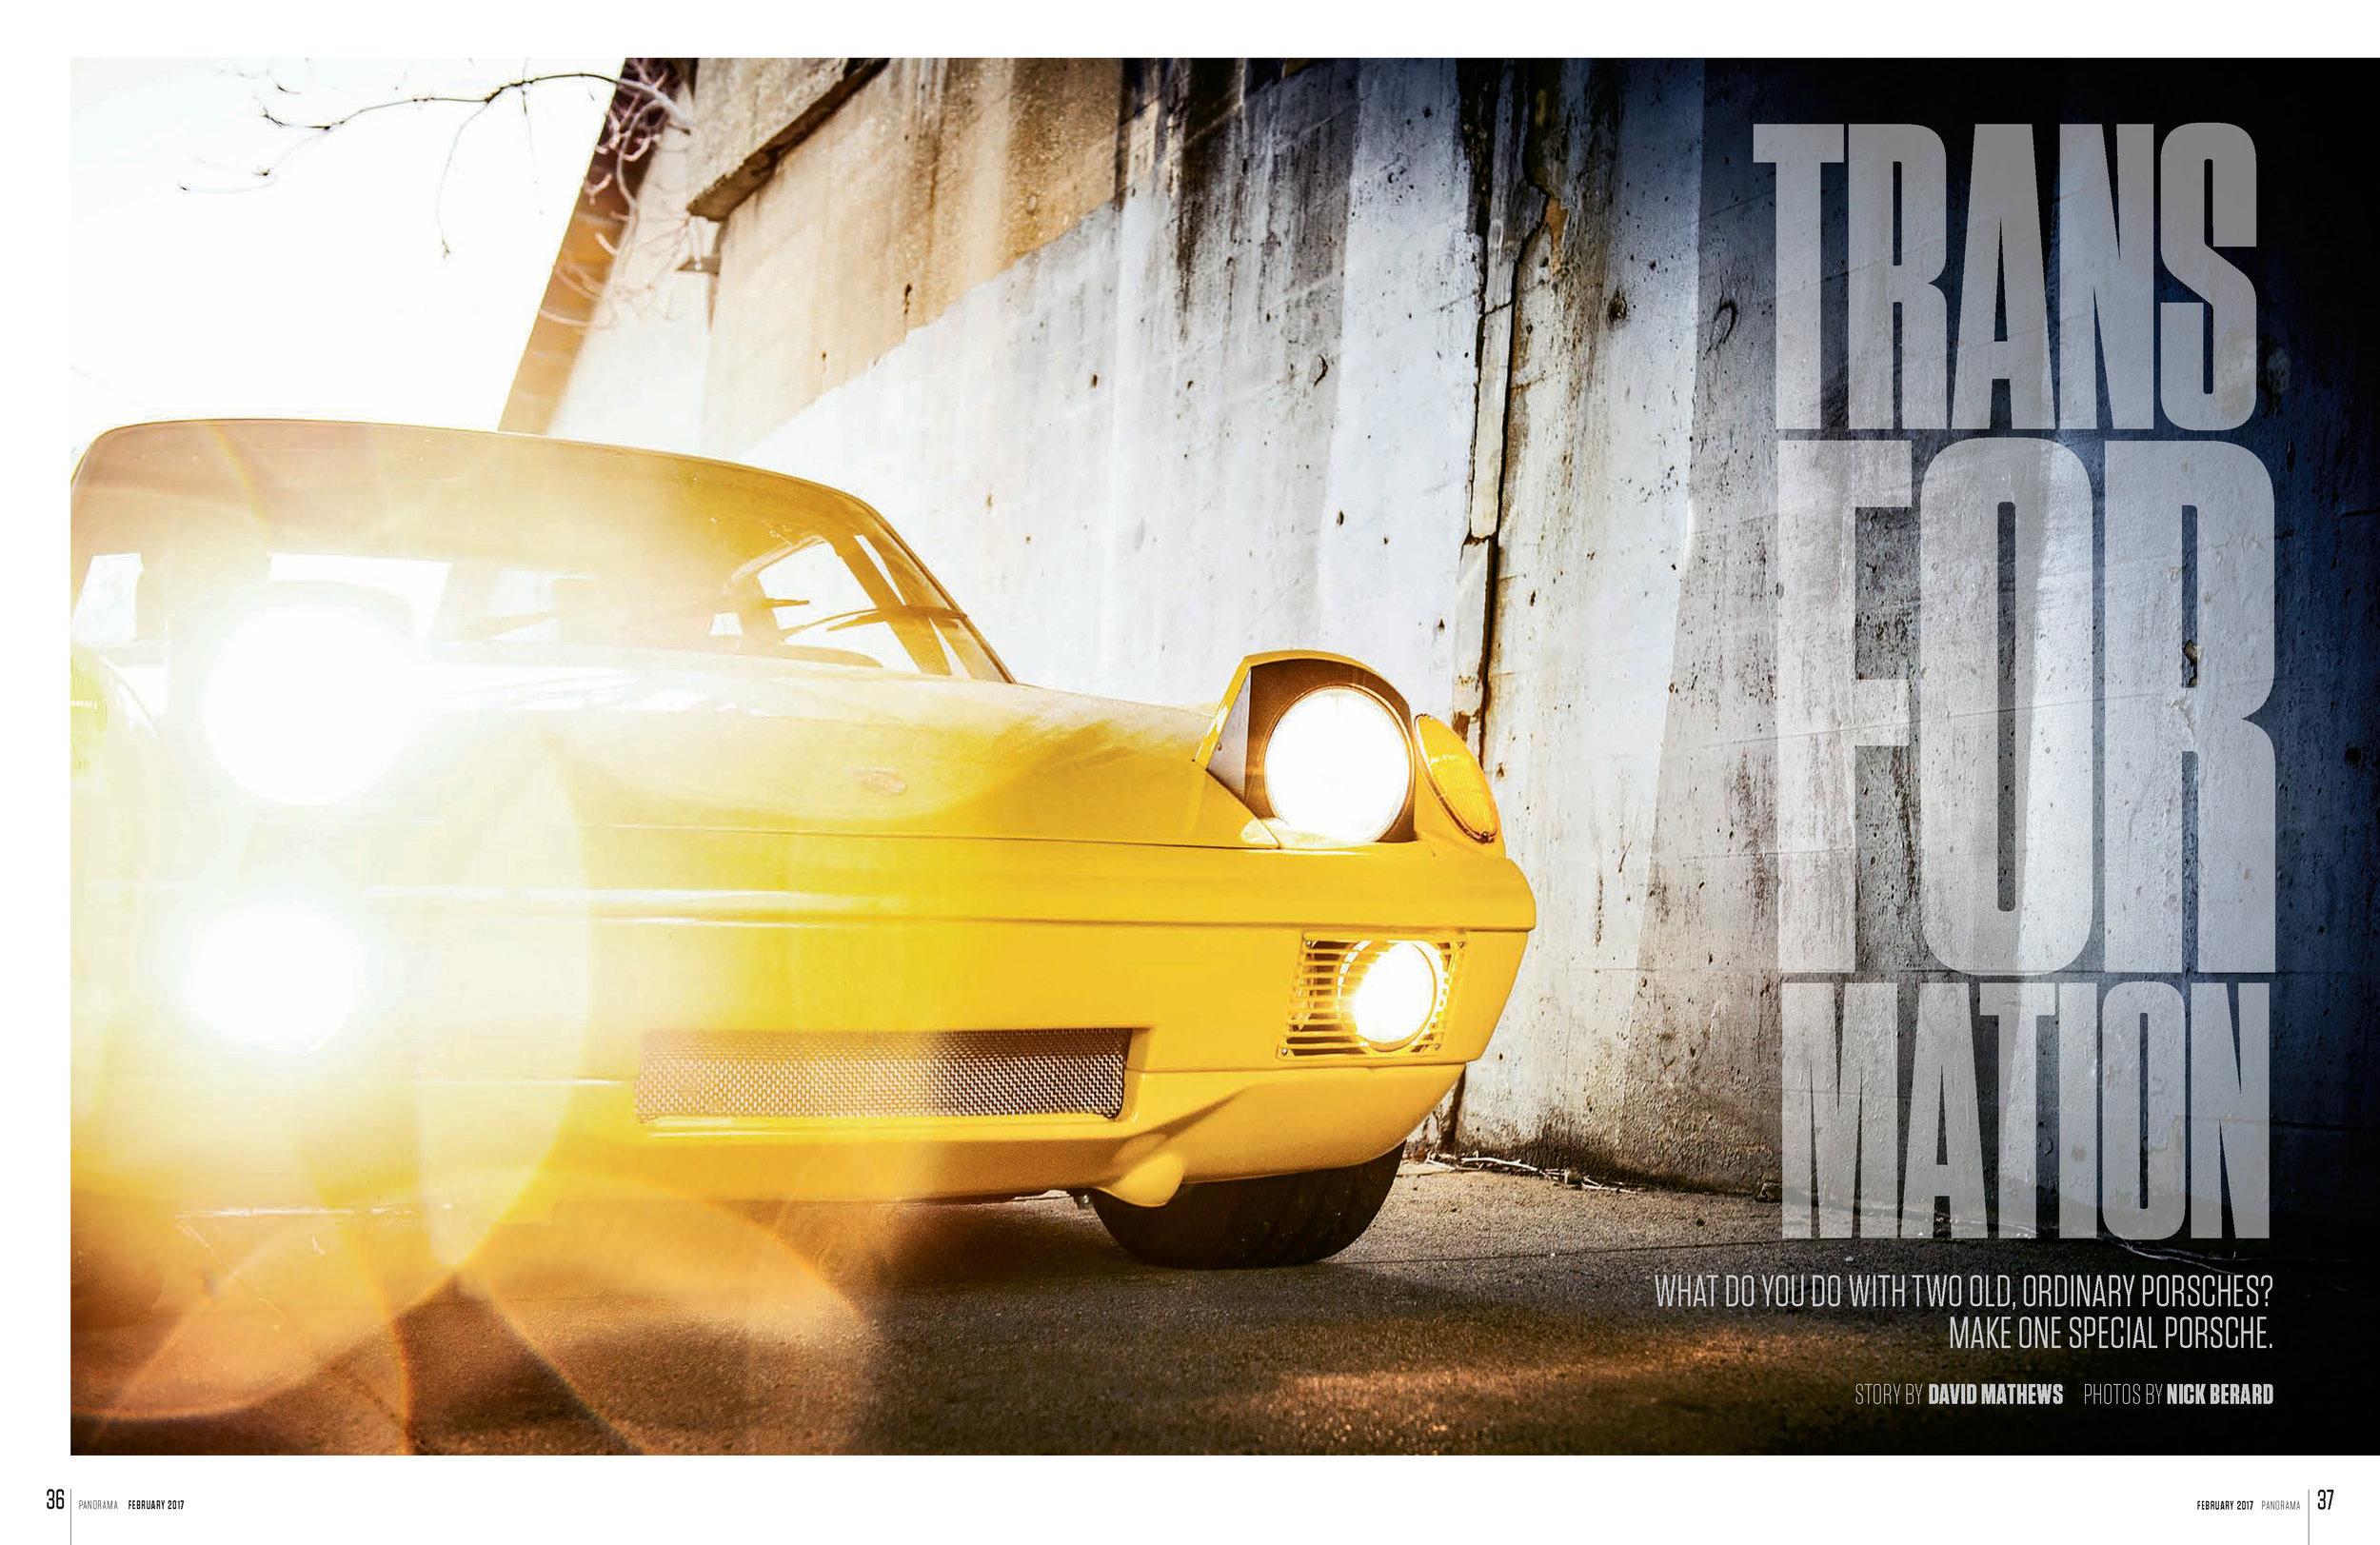 Porsche Panorama - Transformation - FULL ARTICLE